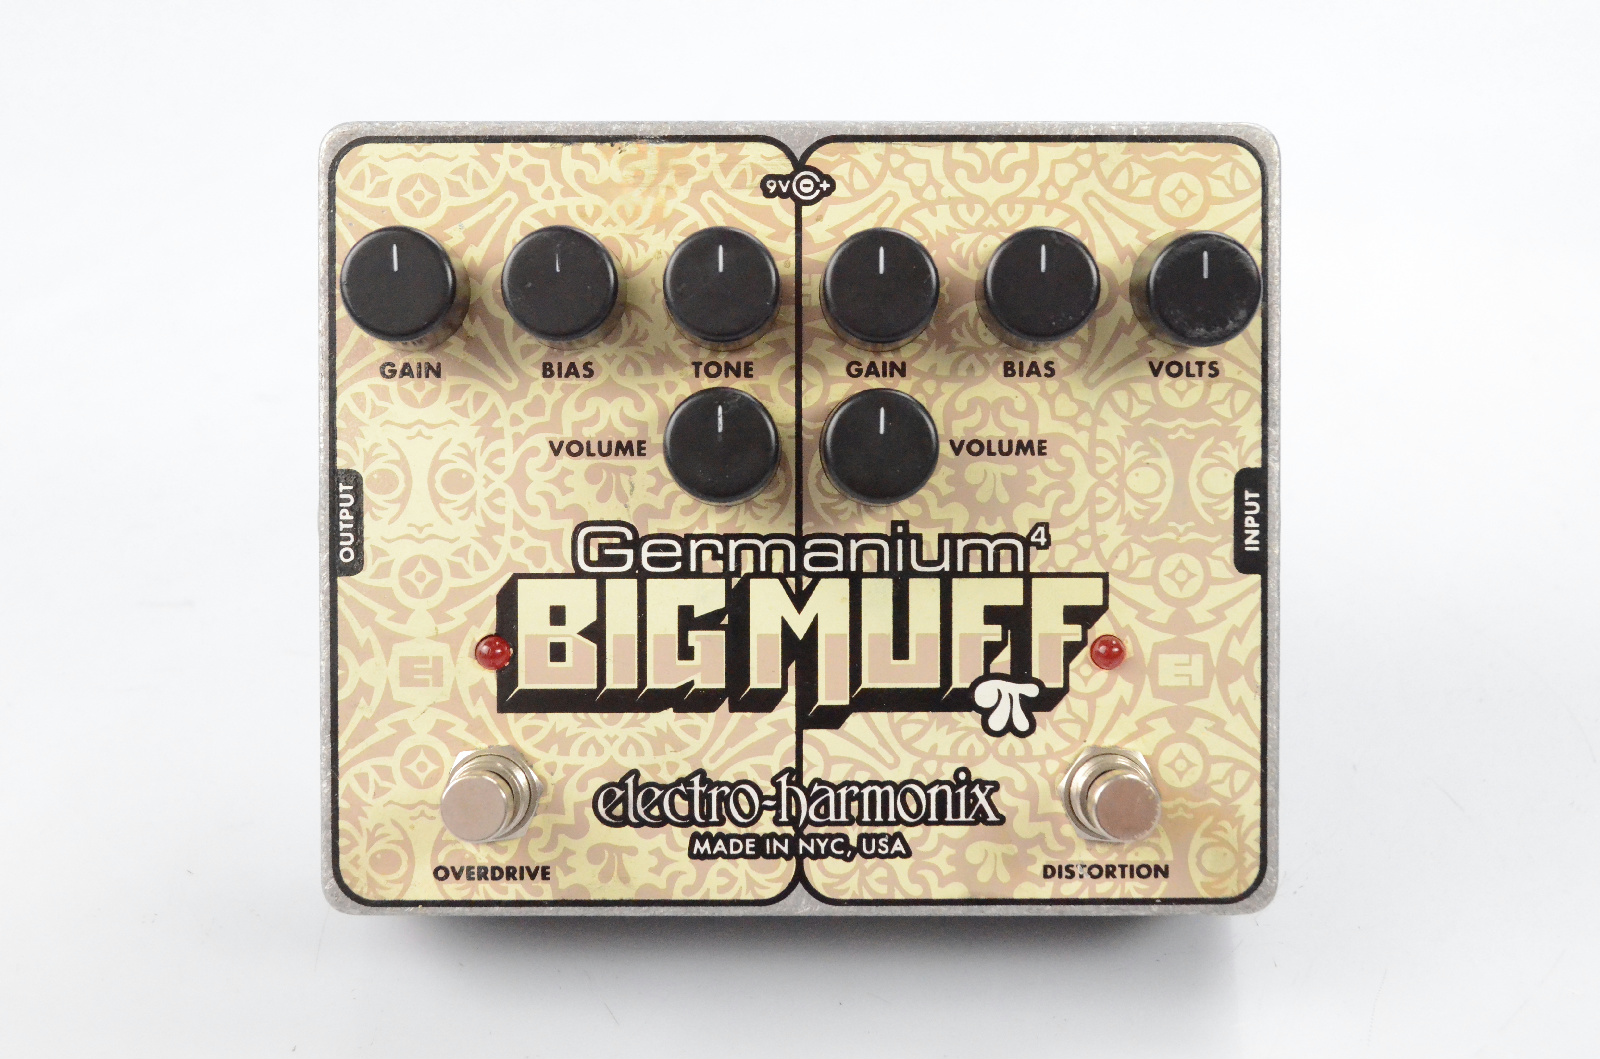 Electro-Harmonix Germanium Big Muff Distortion Fuzz Guitar Pedal EHX #32327